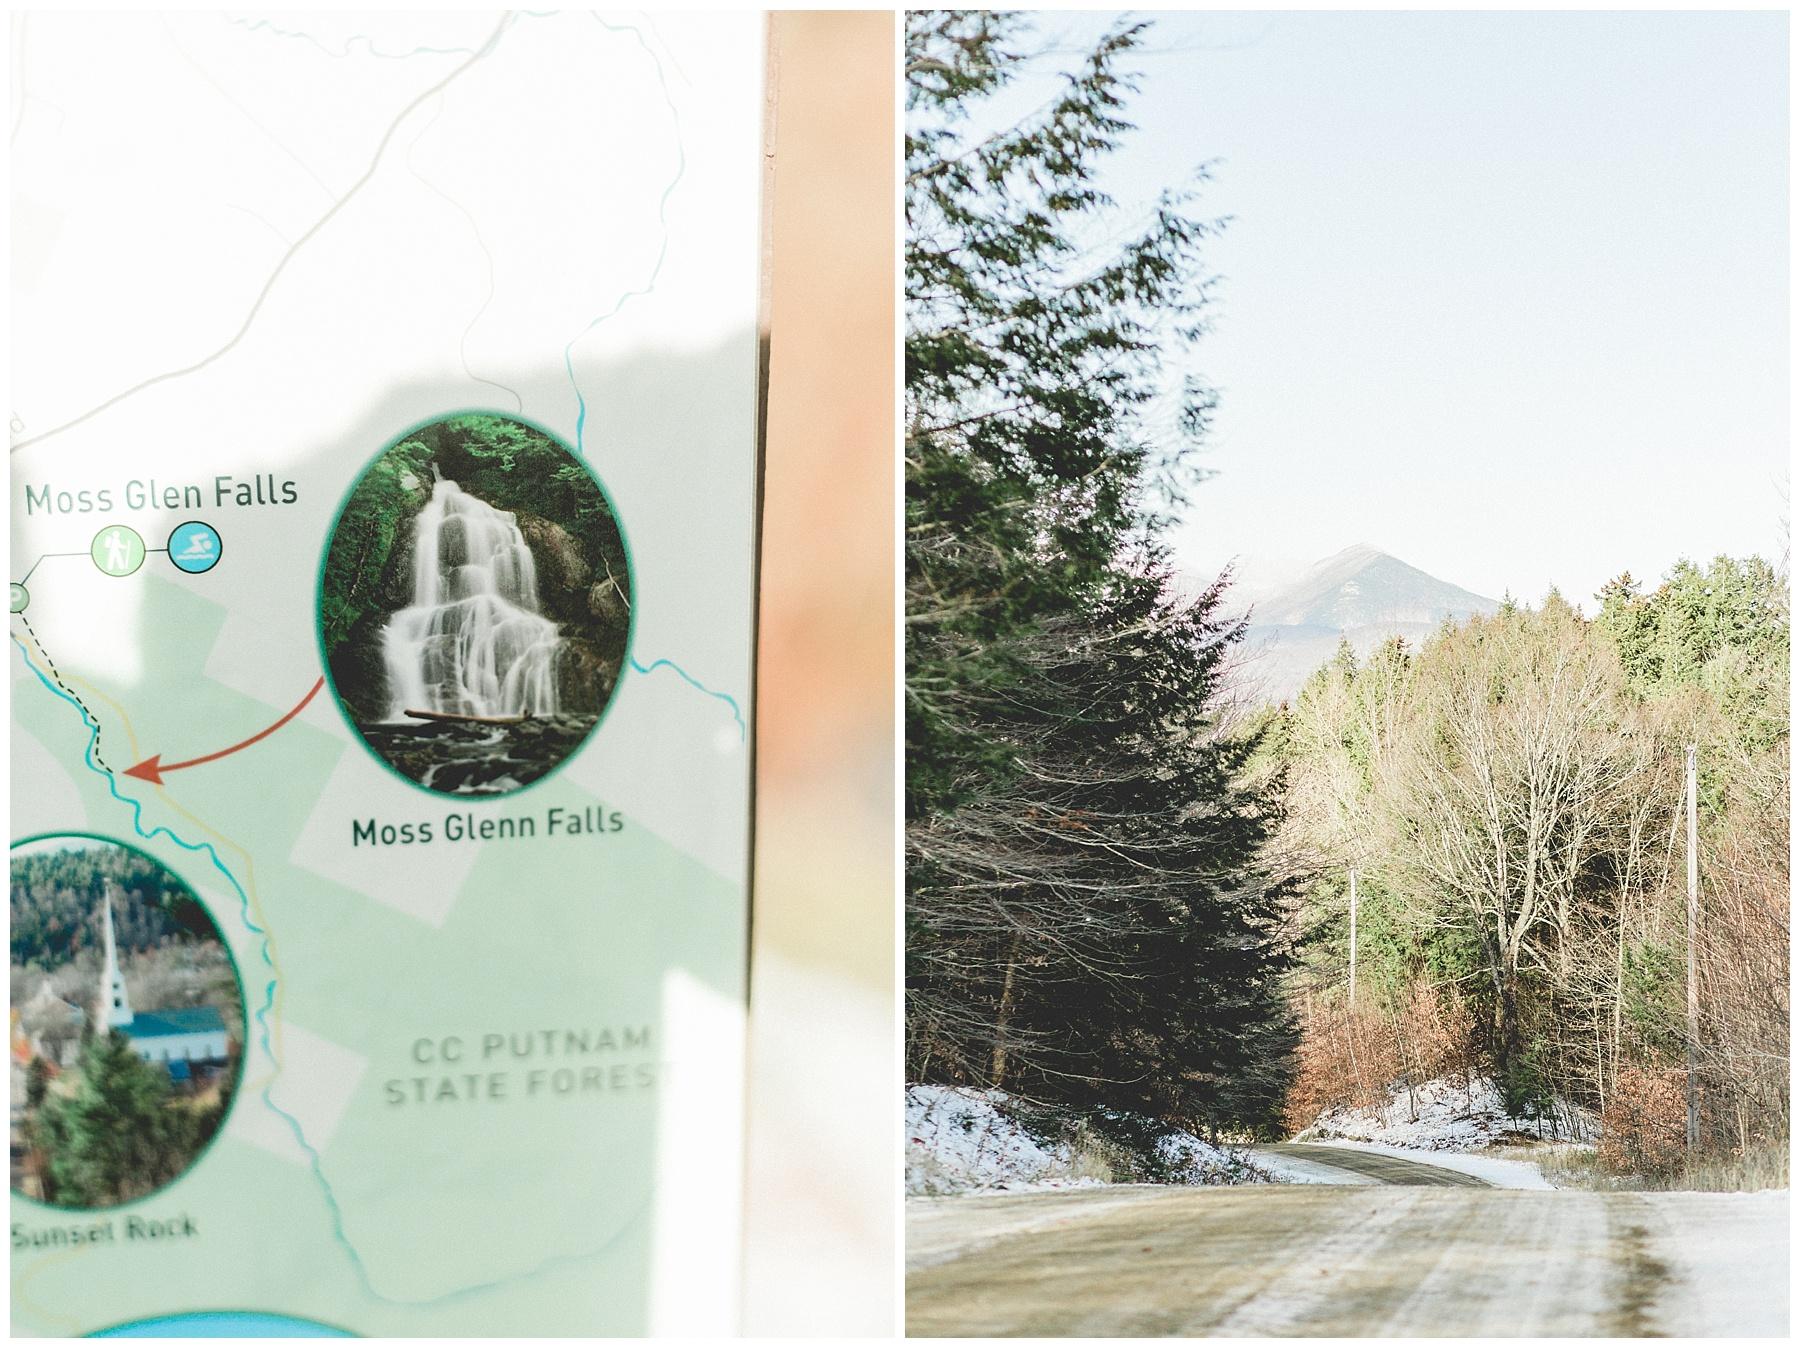 vermont, stowe, engaged, mountains, wanderlove, discoverwanderlove, beauty, proposal, proposal story, ben and jerrys, icecream, rec path, moss glenn falls